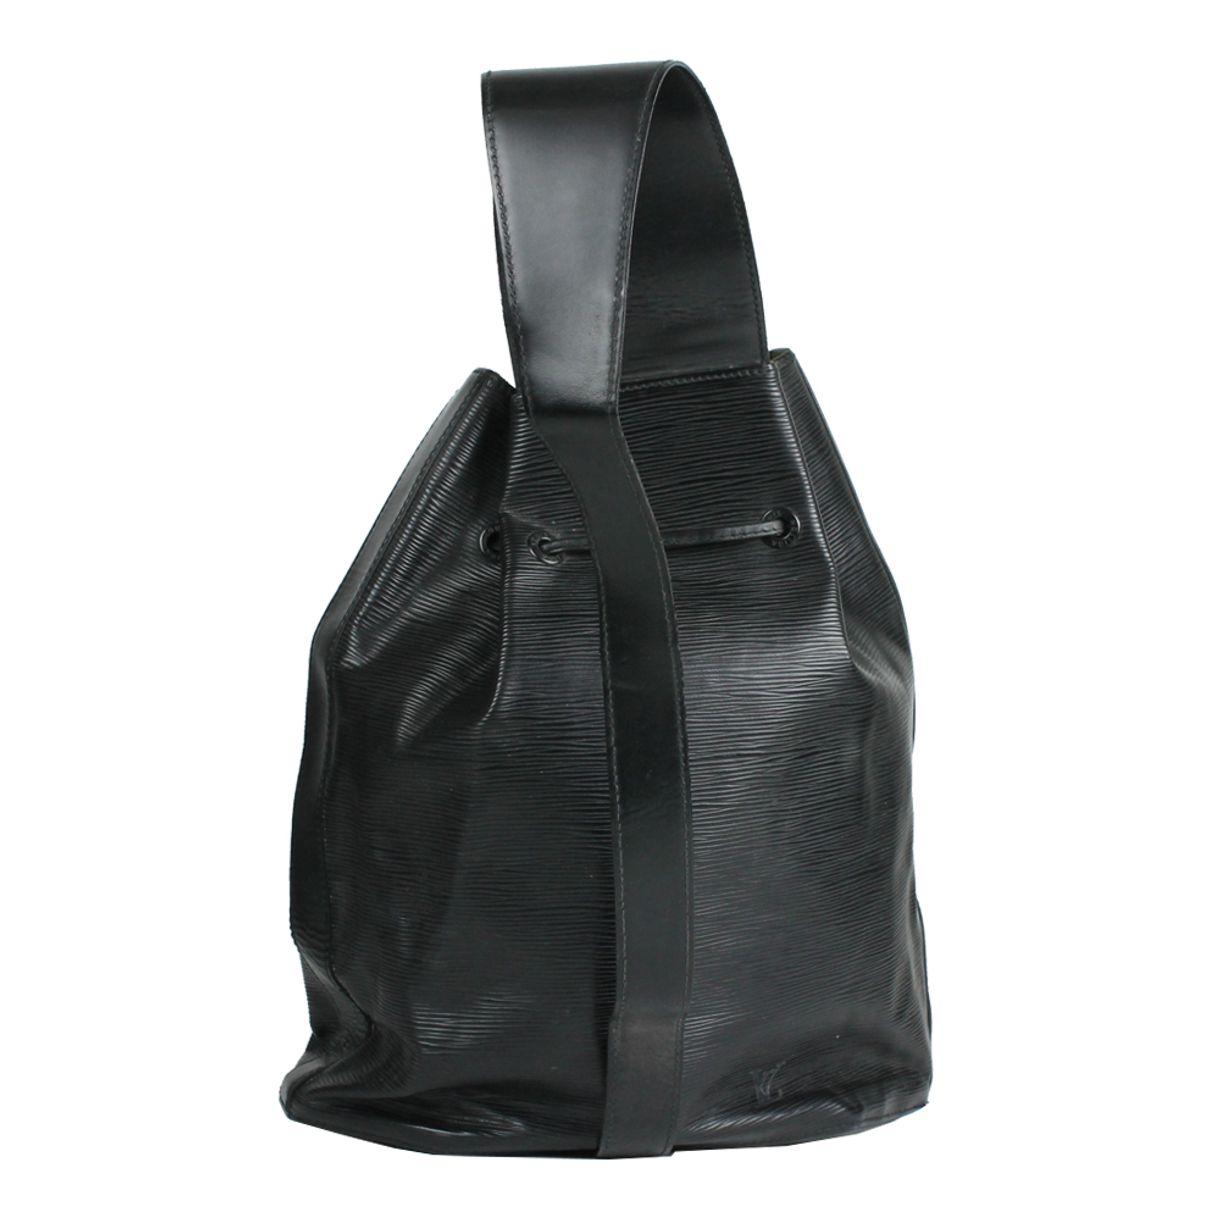 1888-Mochila-Louis-Vuitton-Epi-Leather-One-Strap-Backpack-4